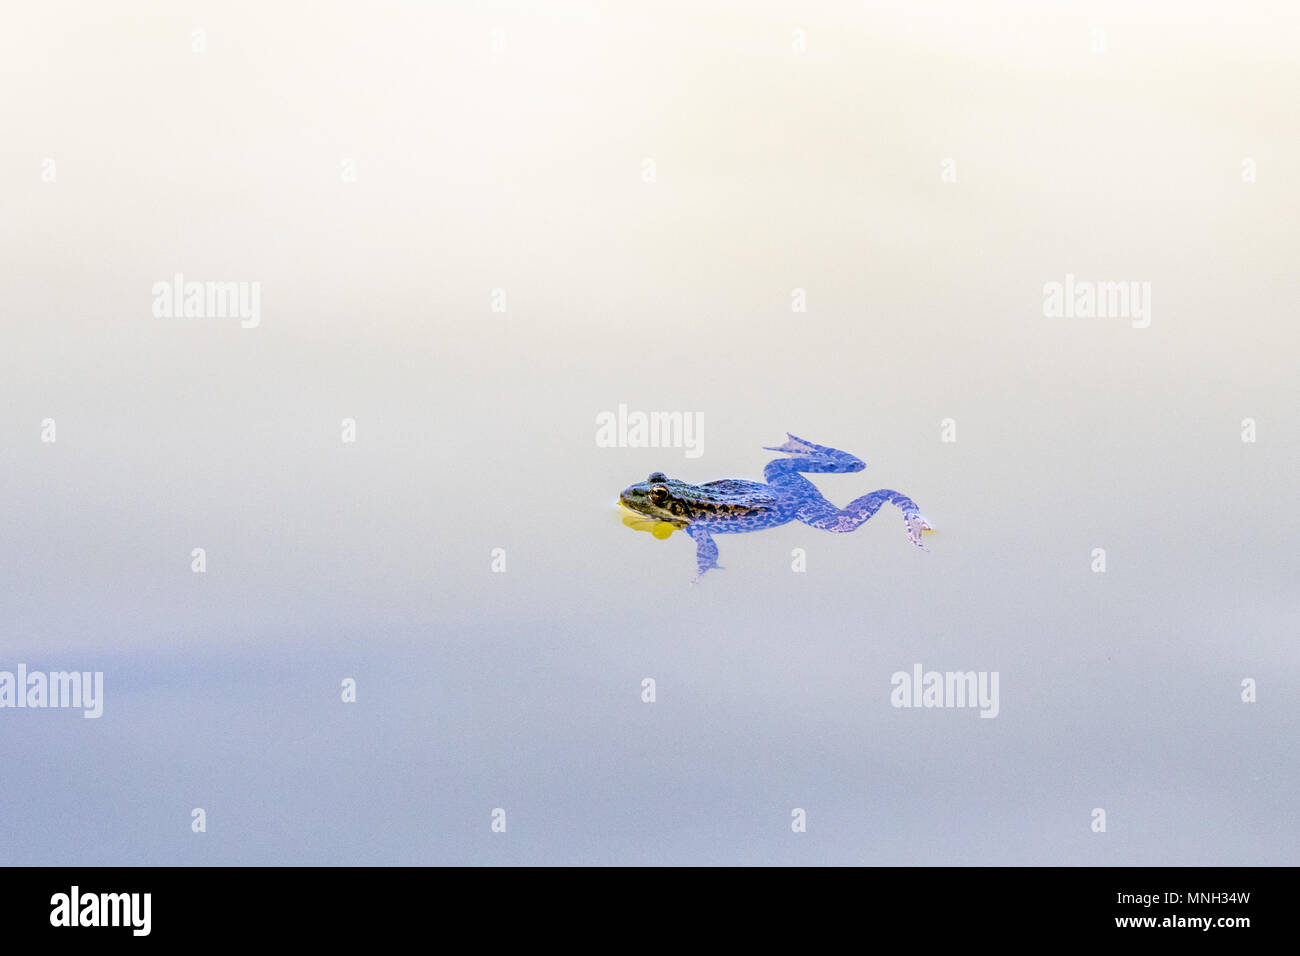 Rana nuotate nel lago Immagini Stock